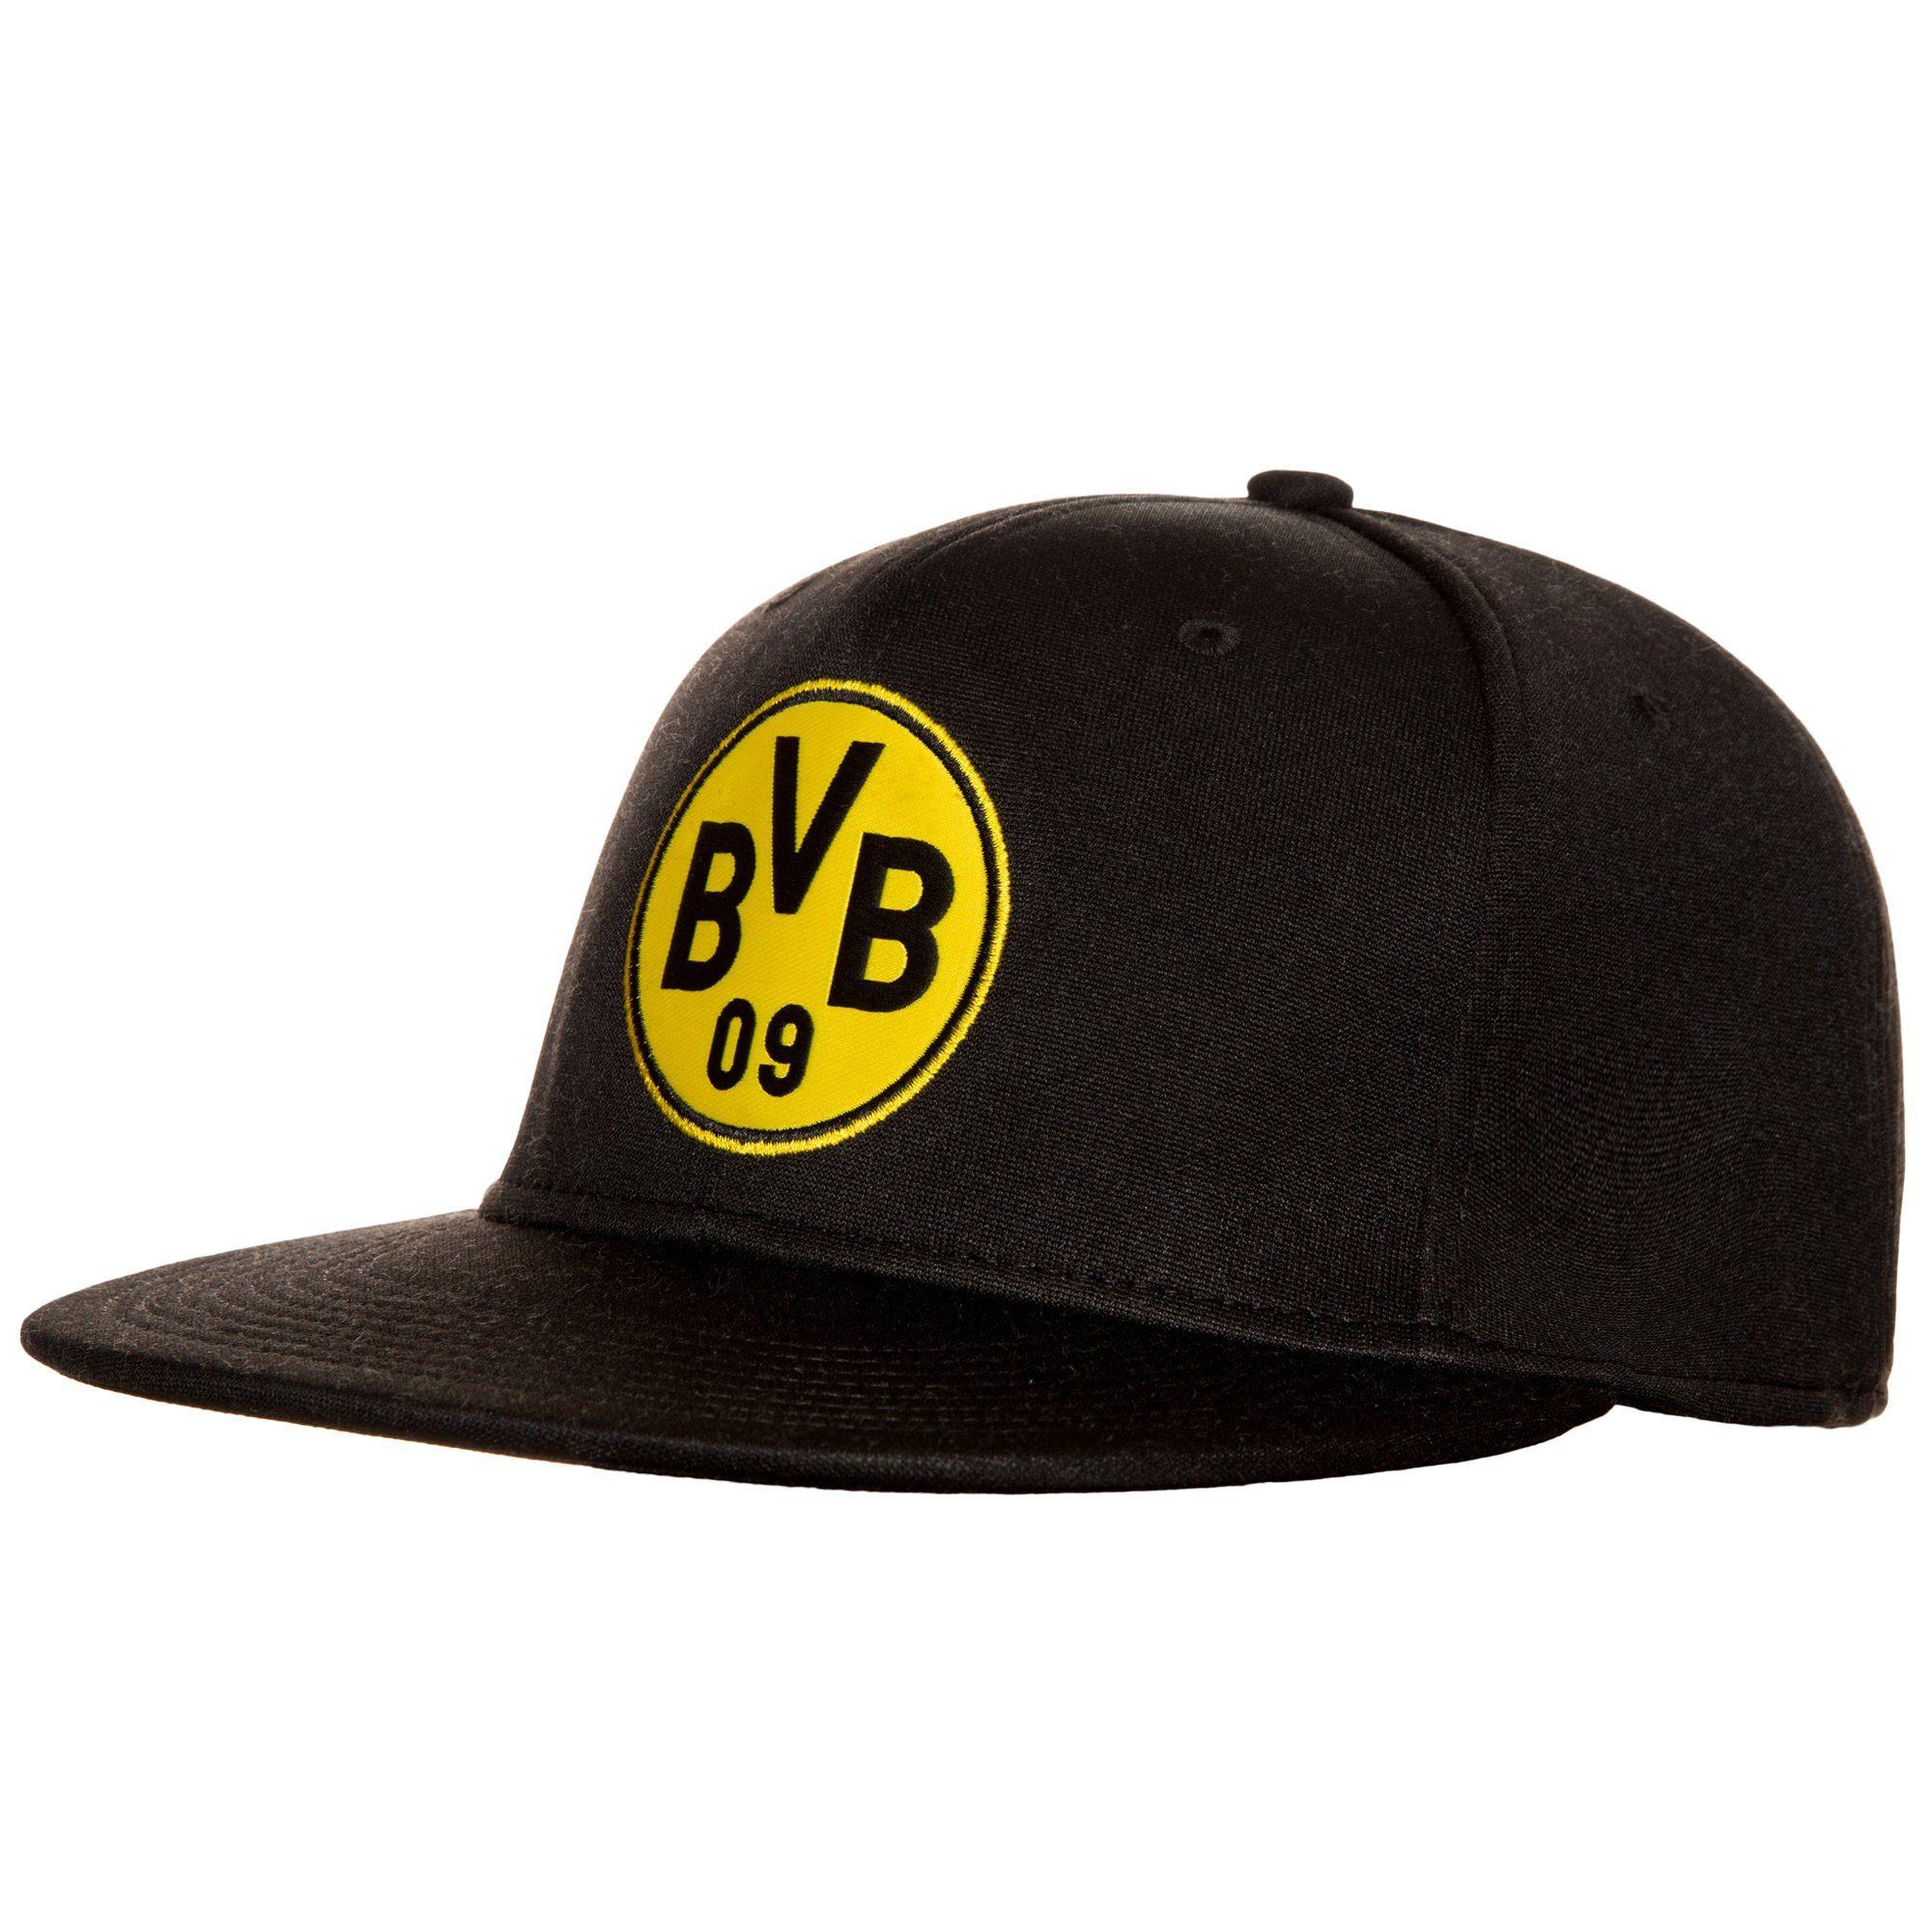 PUMA Borussia Dortmund Stretchfit Logo Cap